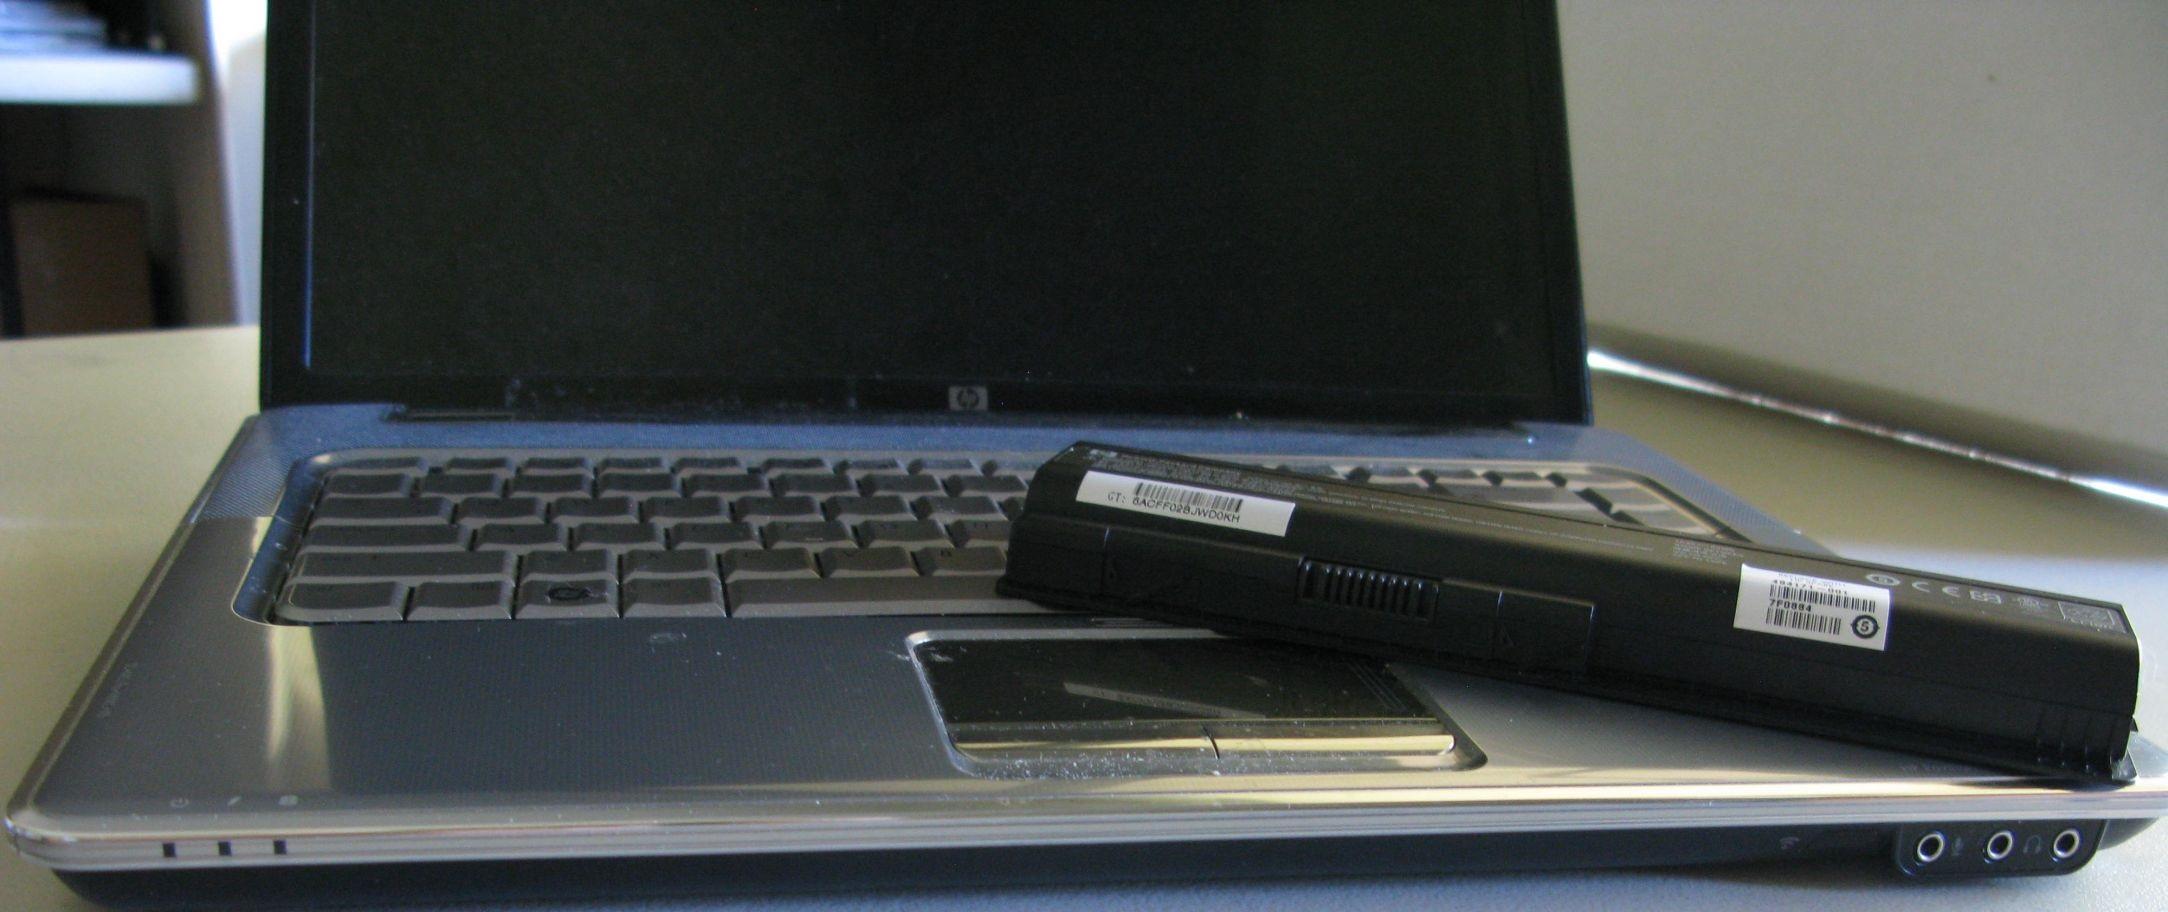 0xc00000e9 - Laptop Battery - 2 - Windows Wally